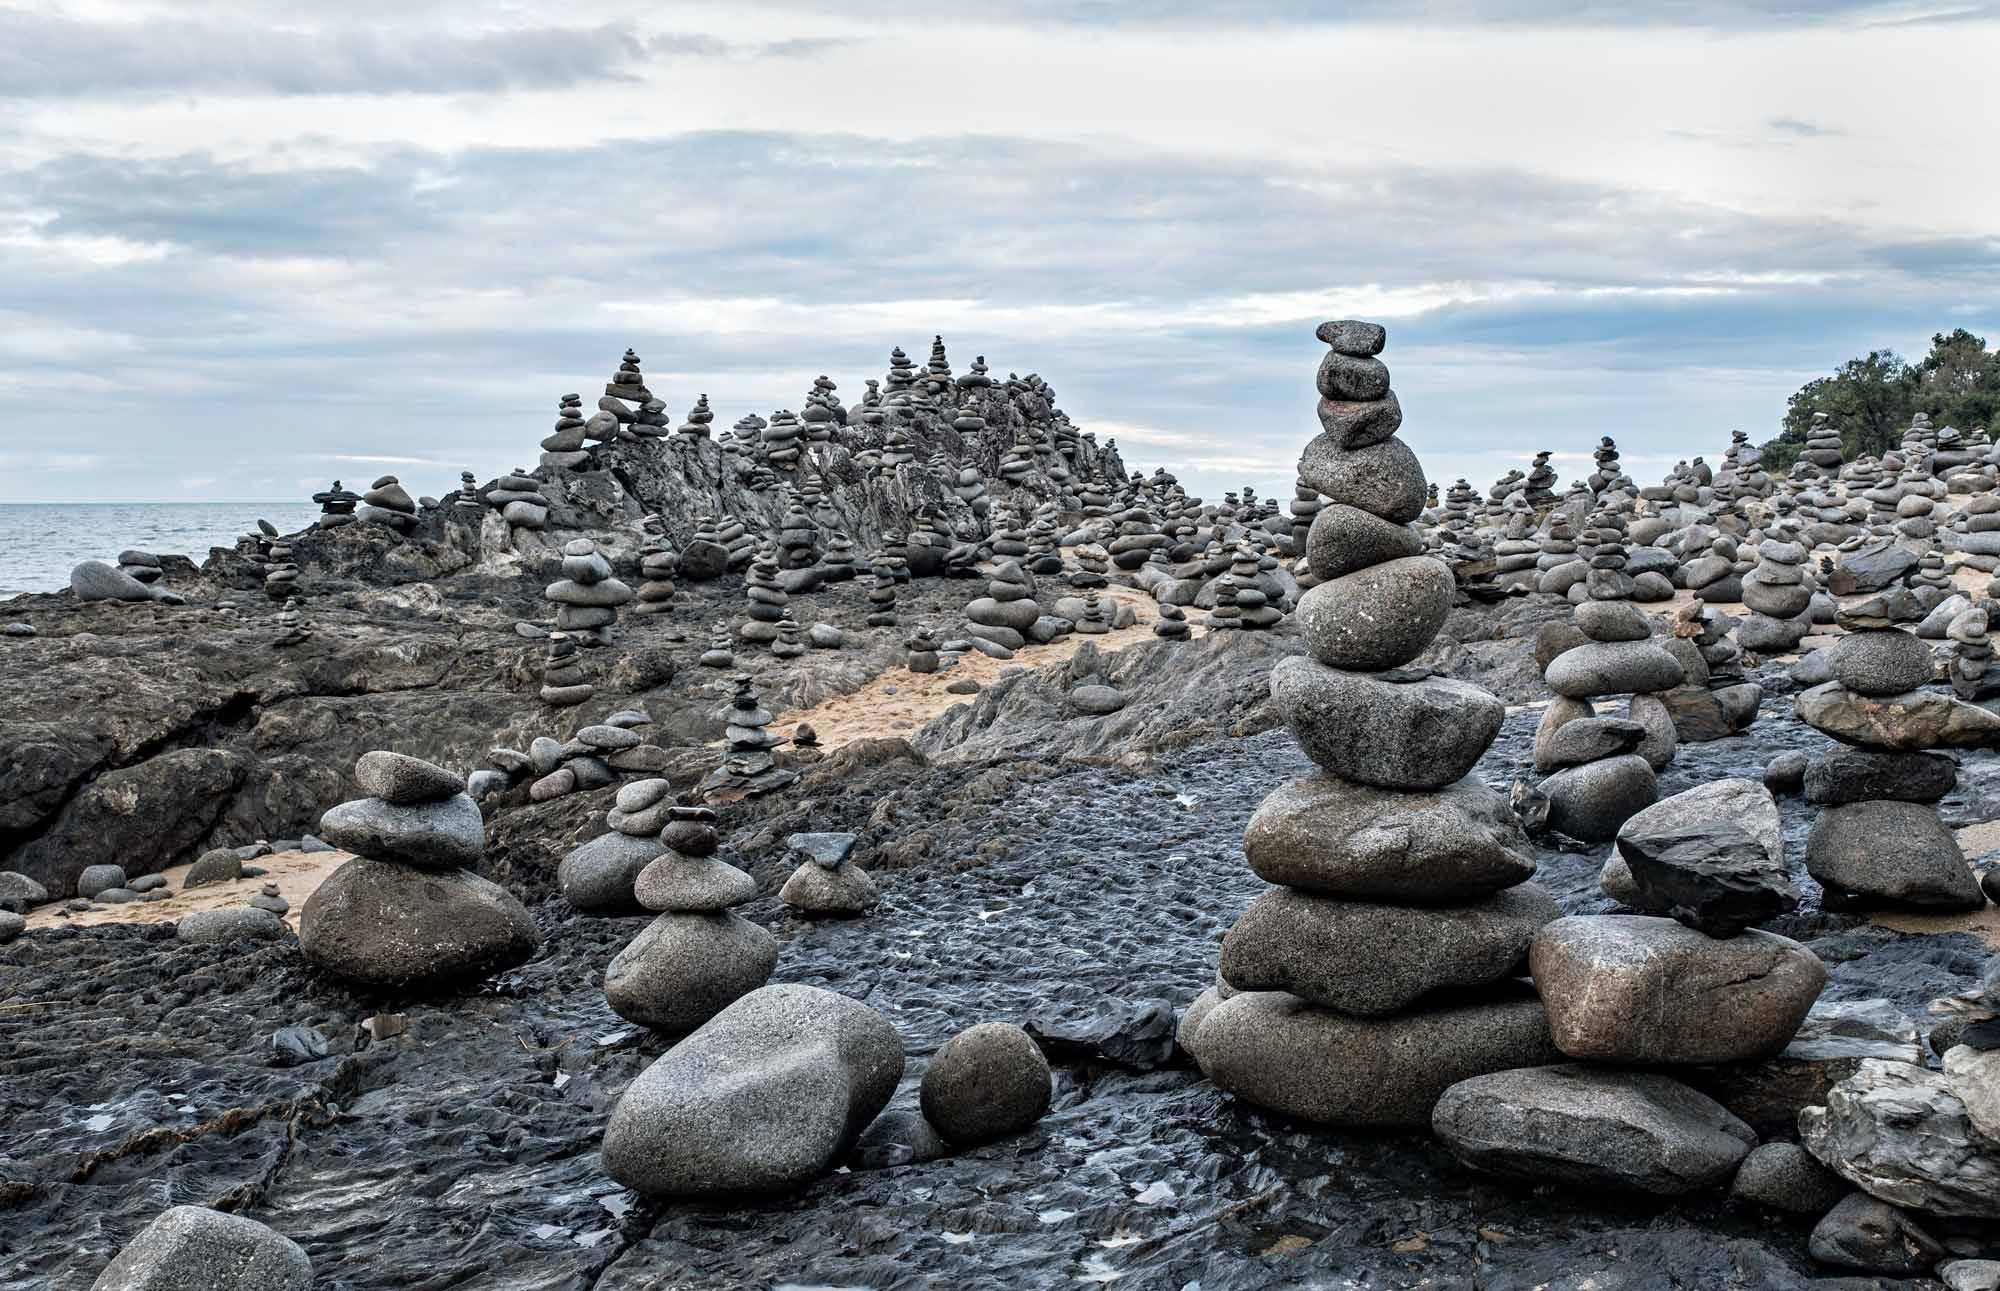 Rock stacks